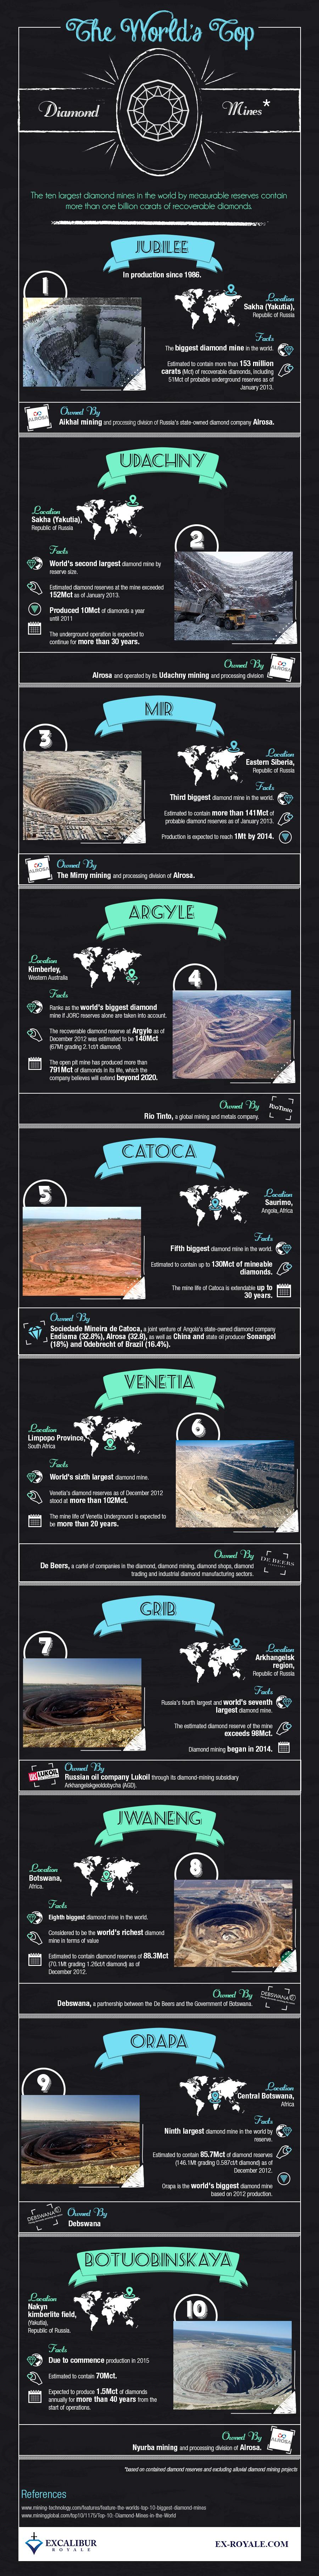 The-Worlds-Top-Diamond-Mines